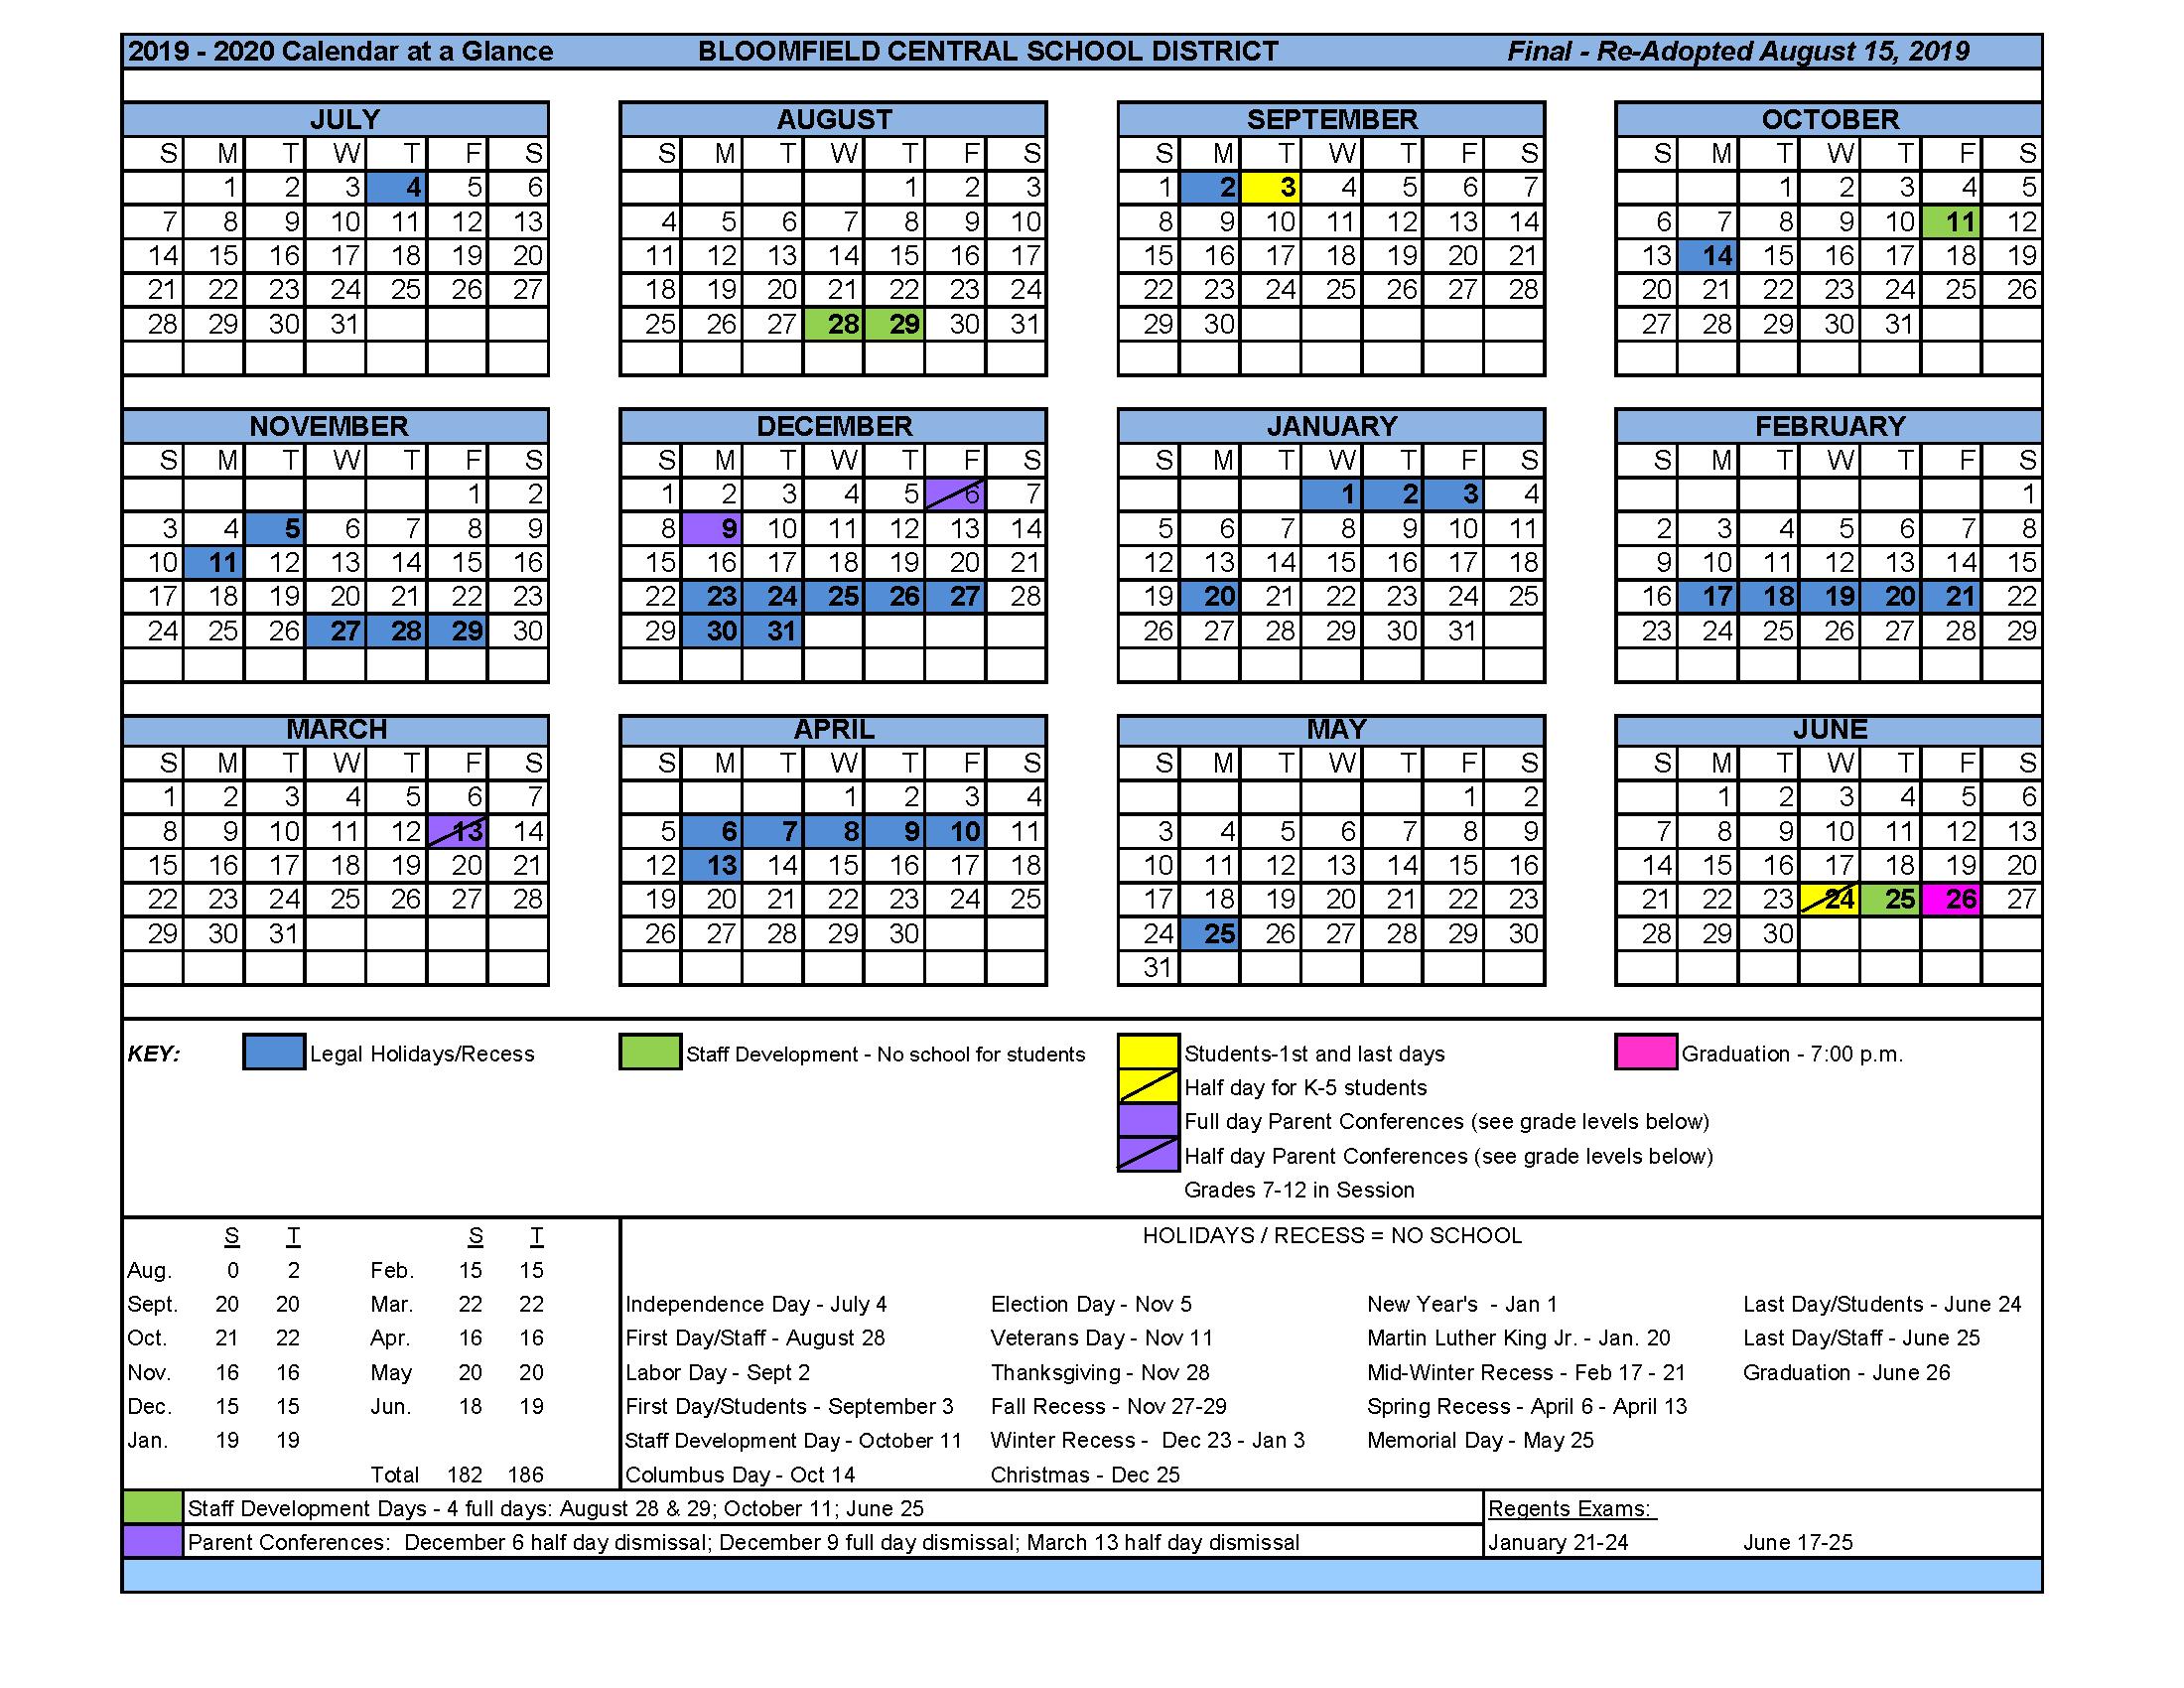 Ccsd Calendar.Calendar At A Glance District Bloomfield Central School District